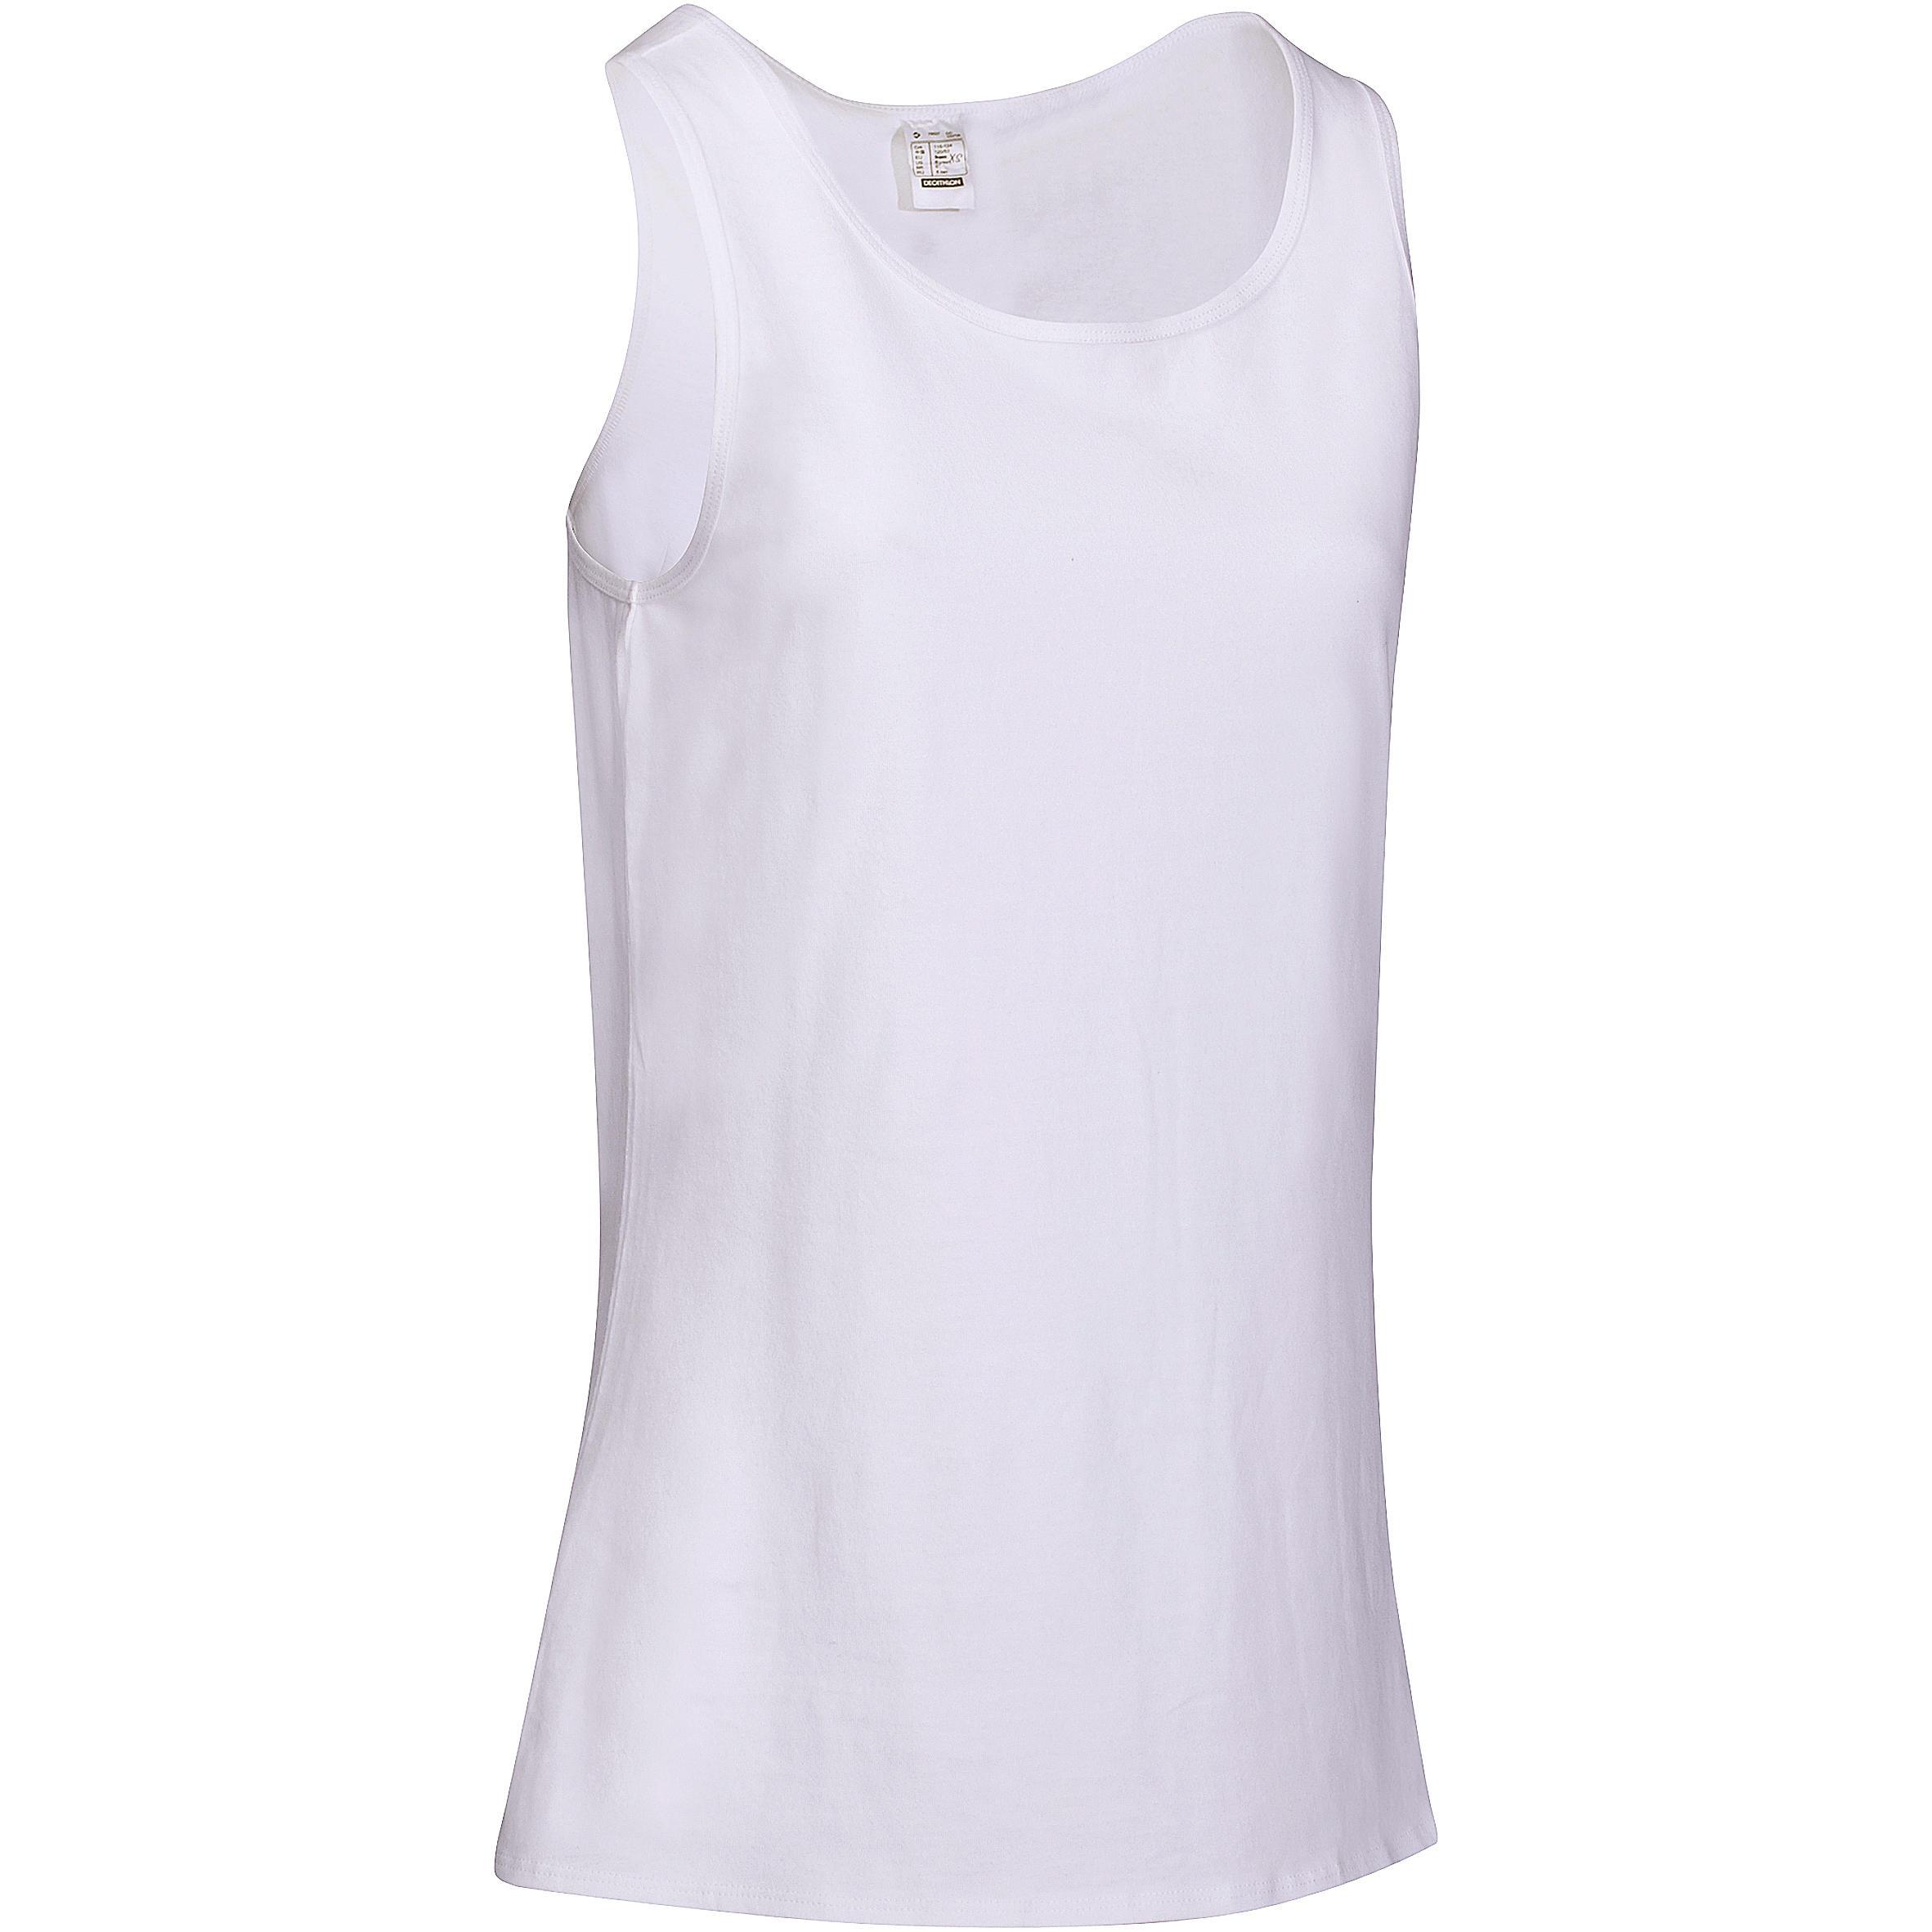 Tozupxik Essentiel Camiseta Fitness Sisa Blanca Mujer Manga tsQxhrCd